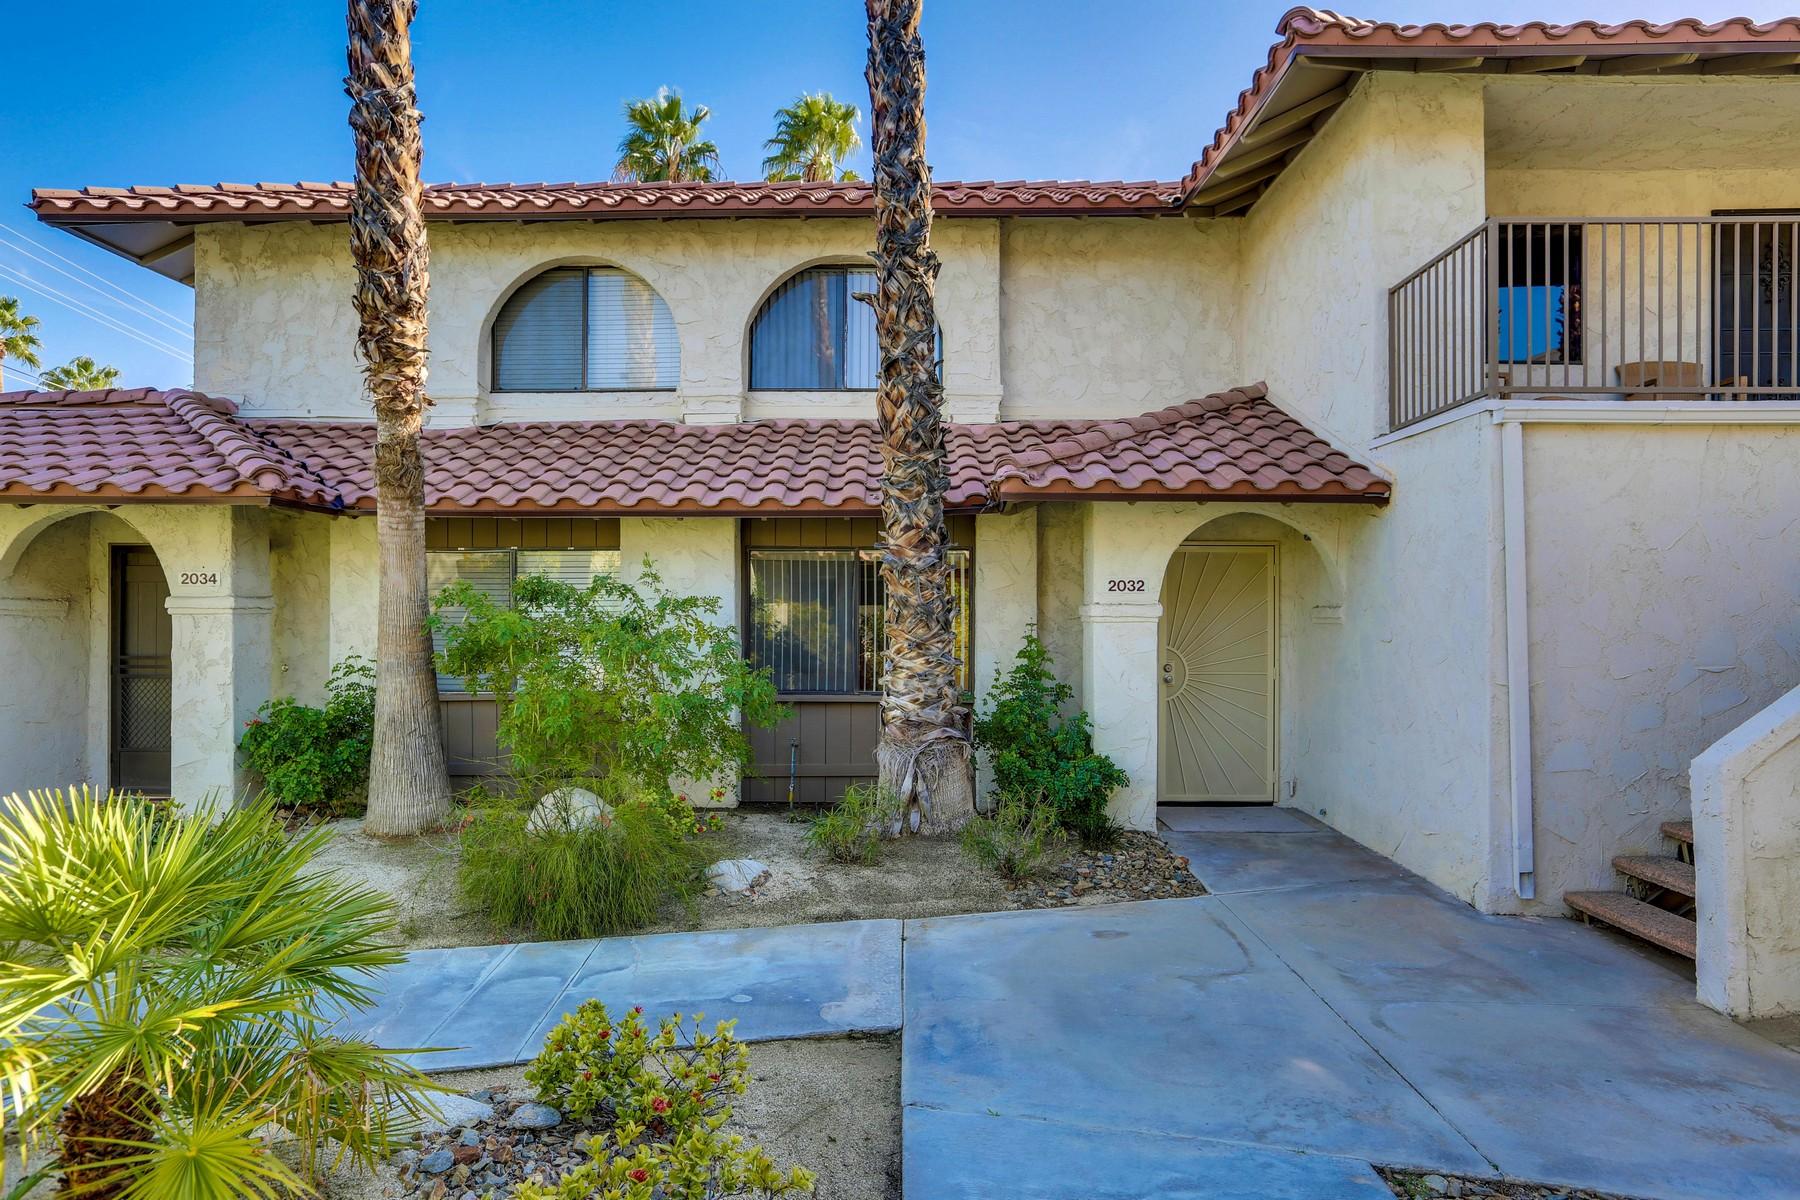 Condominium for Sale at 2032 North Mira Vista Way Palm Springs, California, 92262 United States